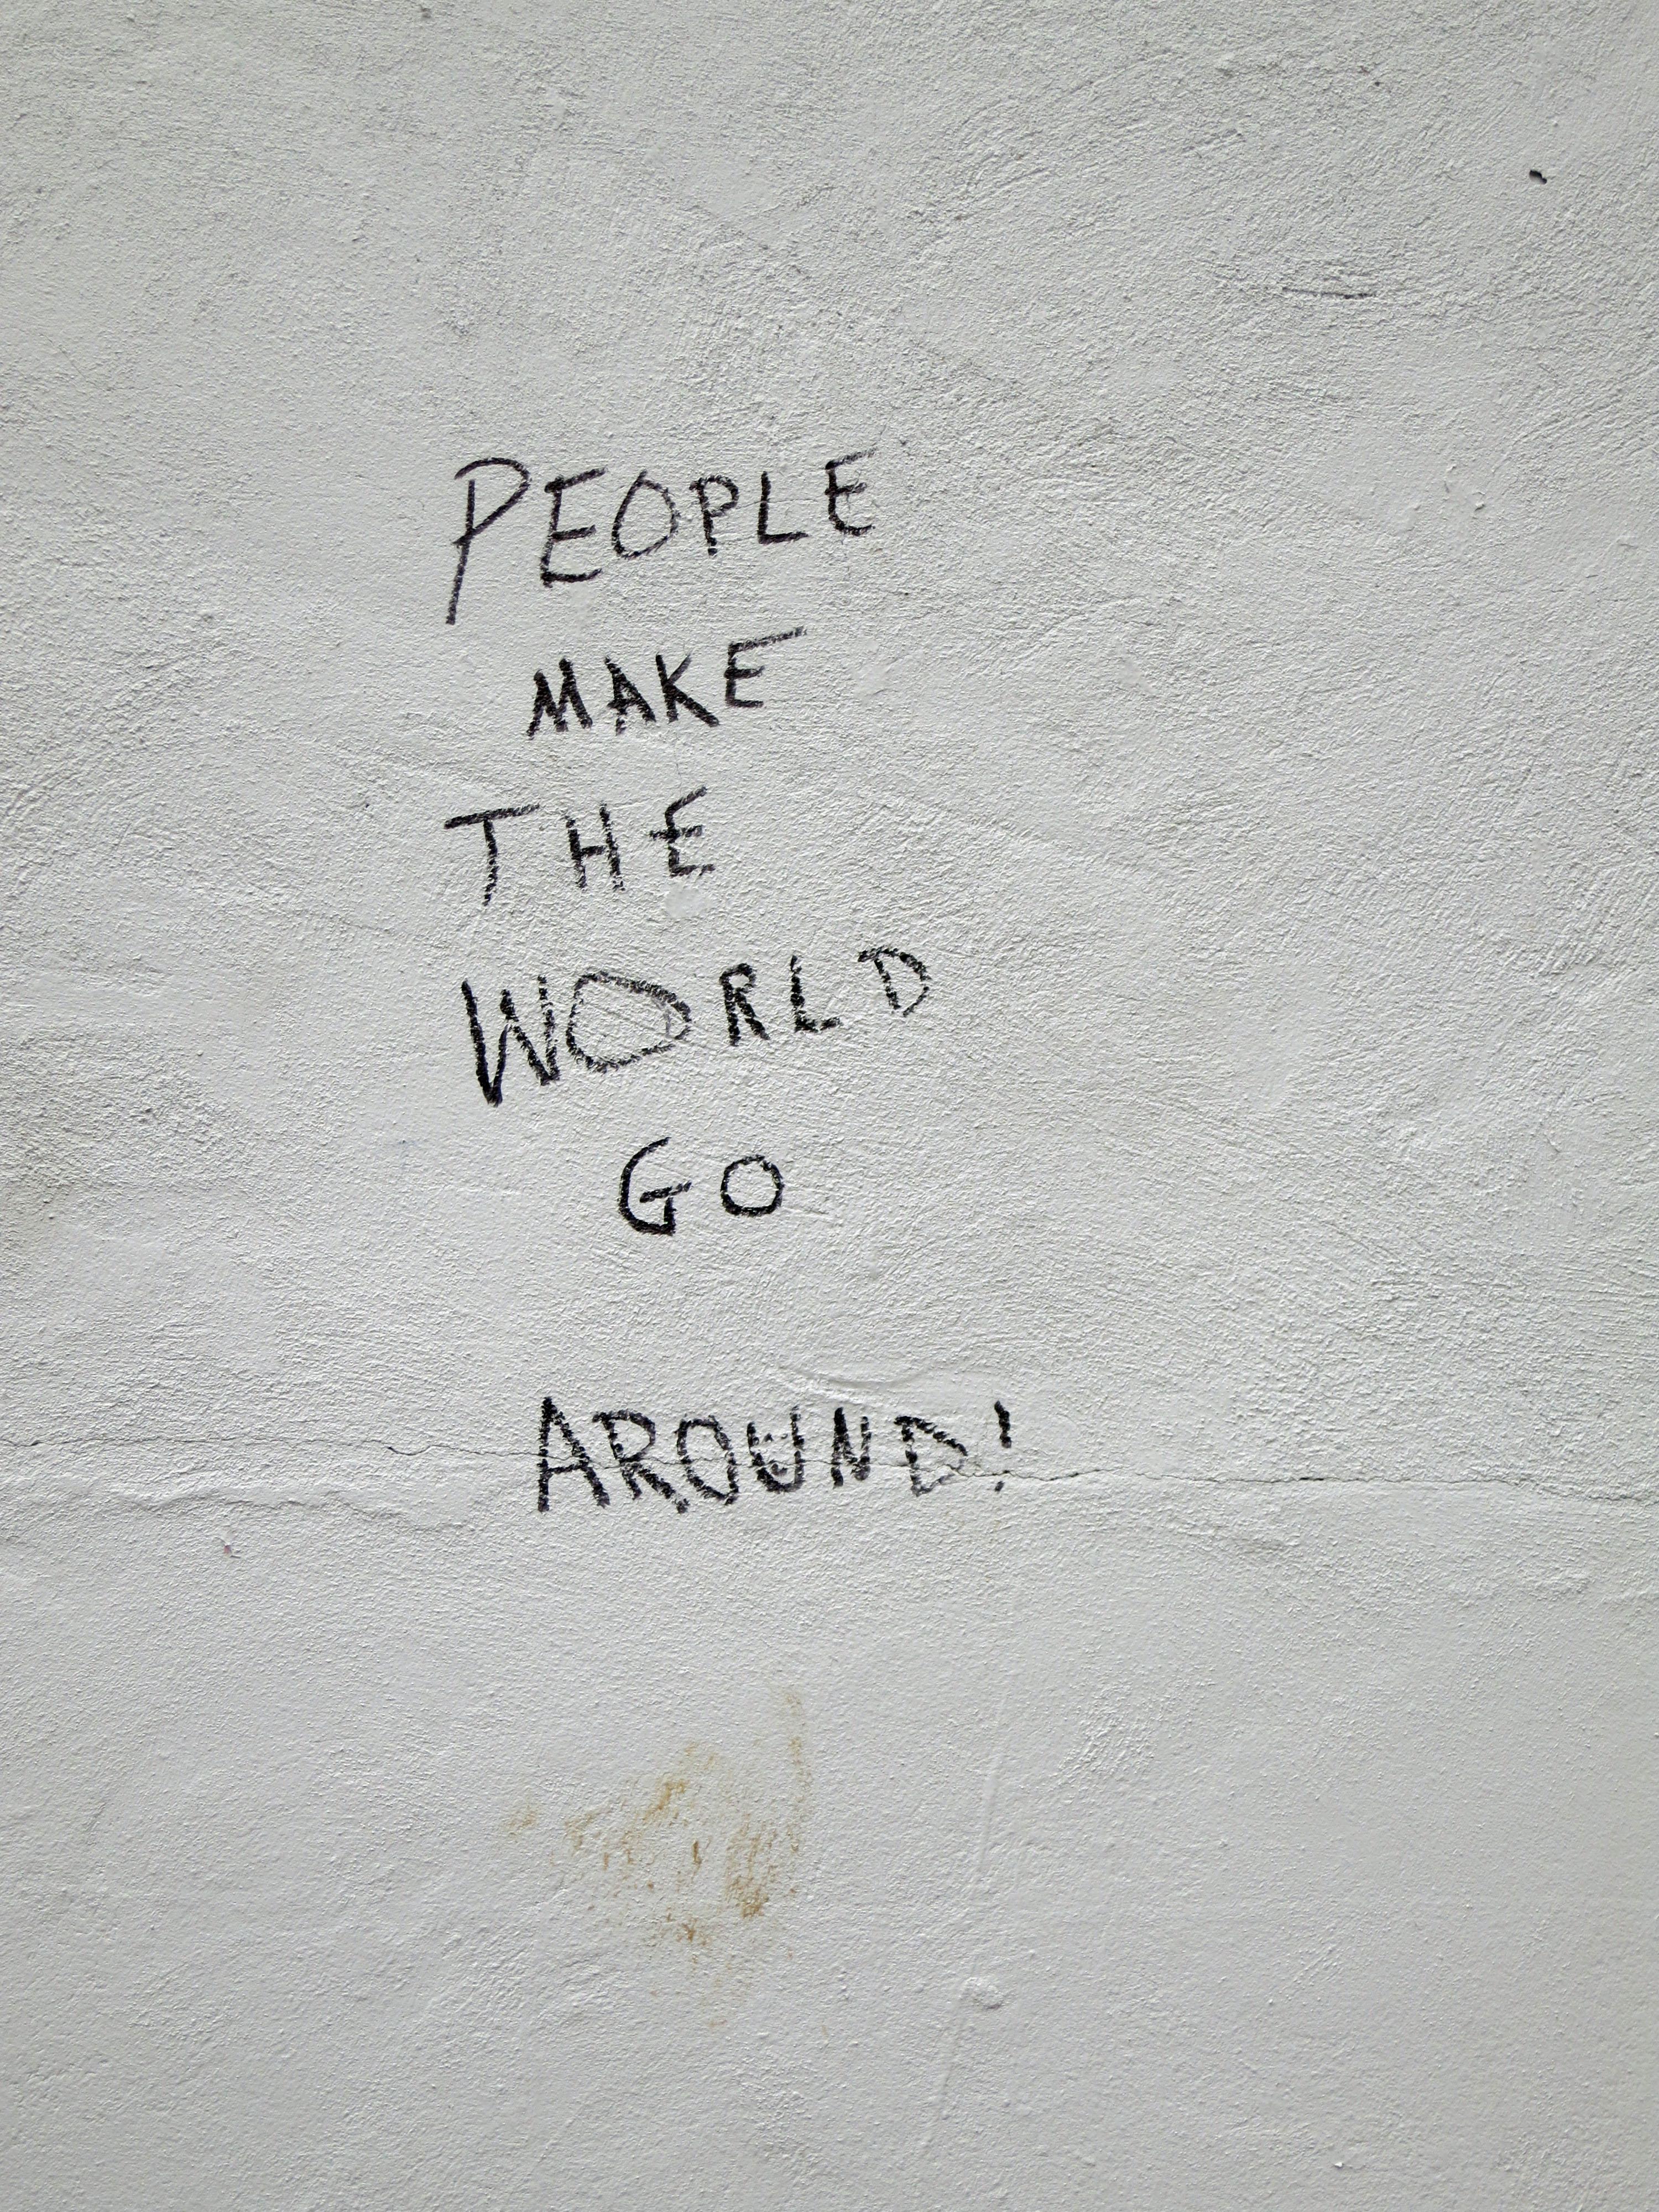 La gente hace que el mundo gire, Around, Dc, Graffiti, People, HQ Photo